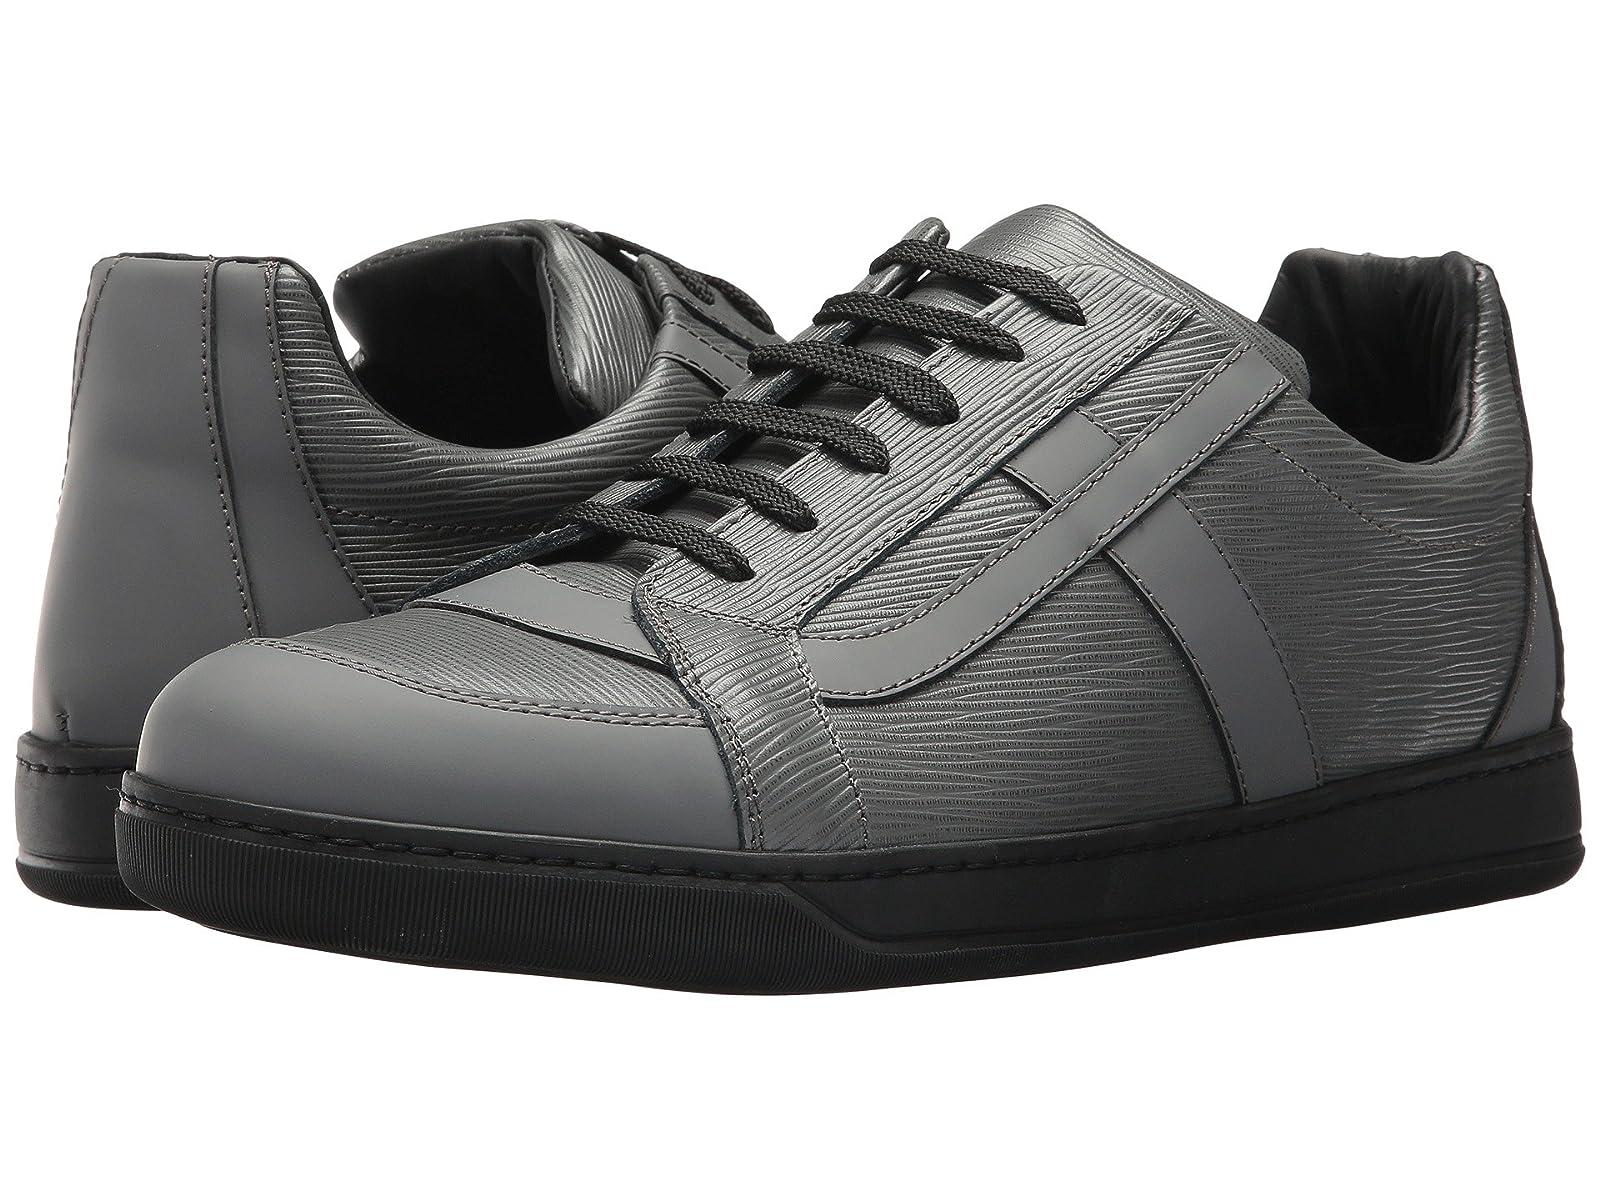 BUGATCHI Novecento SneakerCheap and distinctive eye-catching shoes